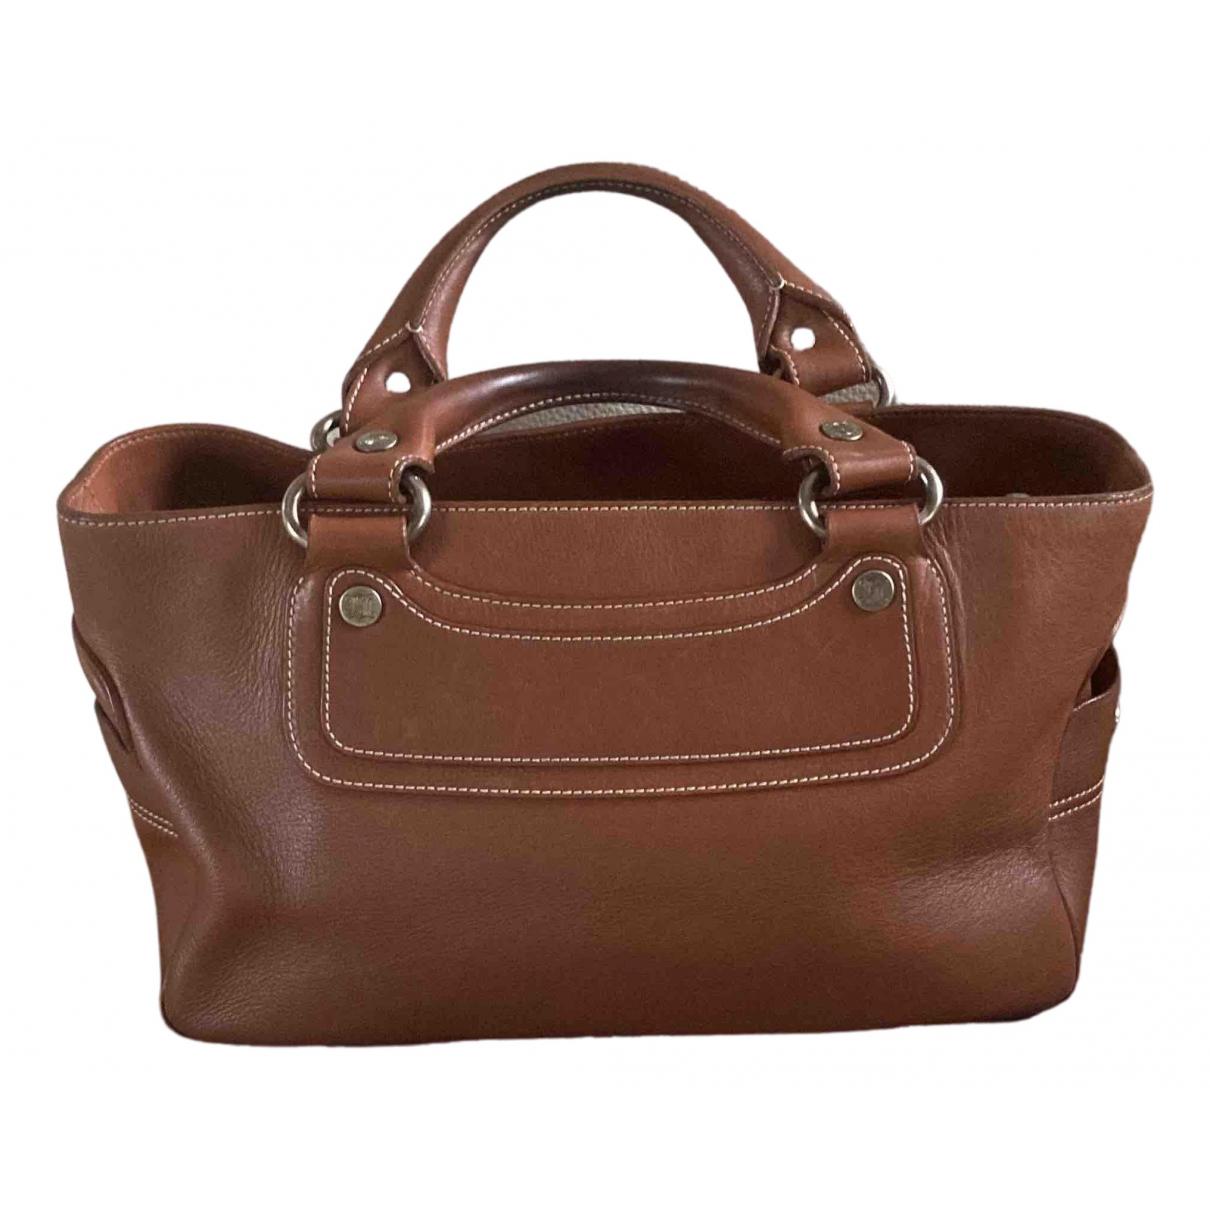 Celine Boogie Brown Leather handbag for Women N